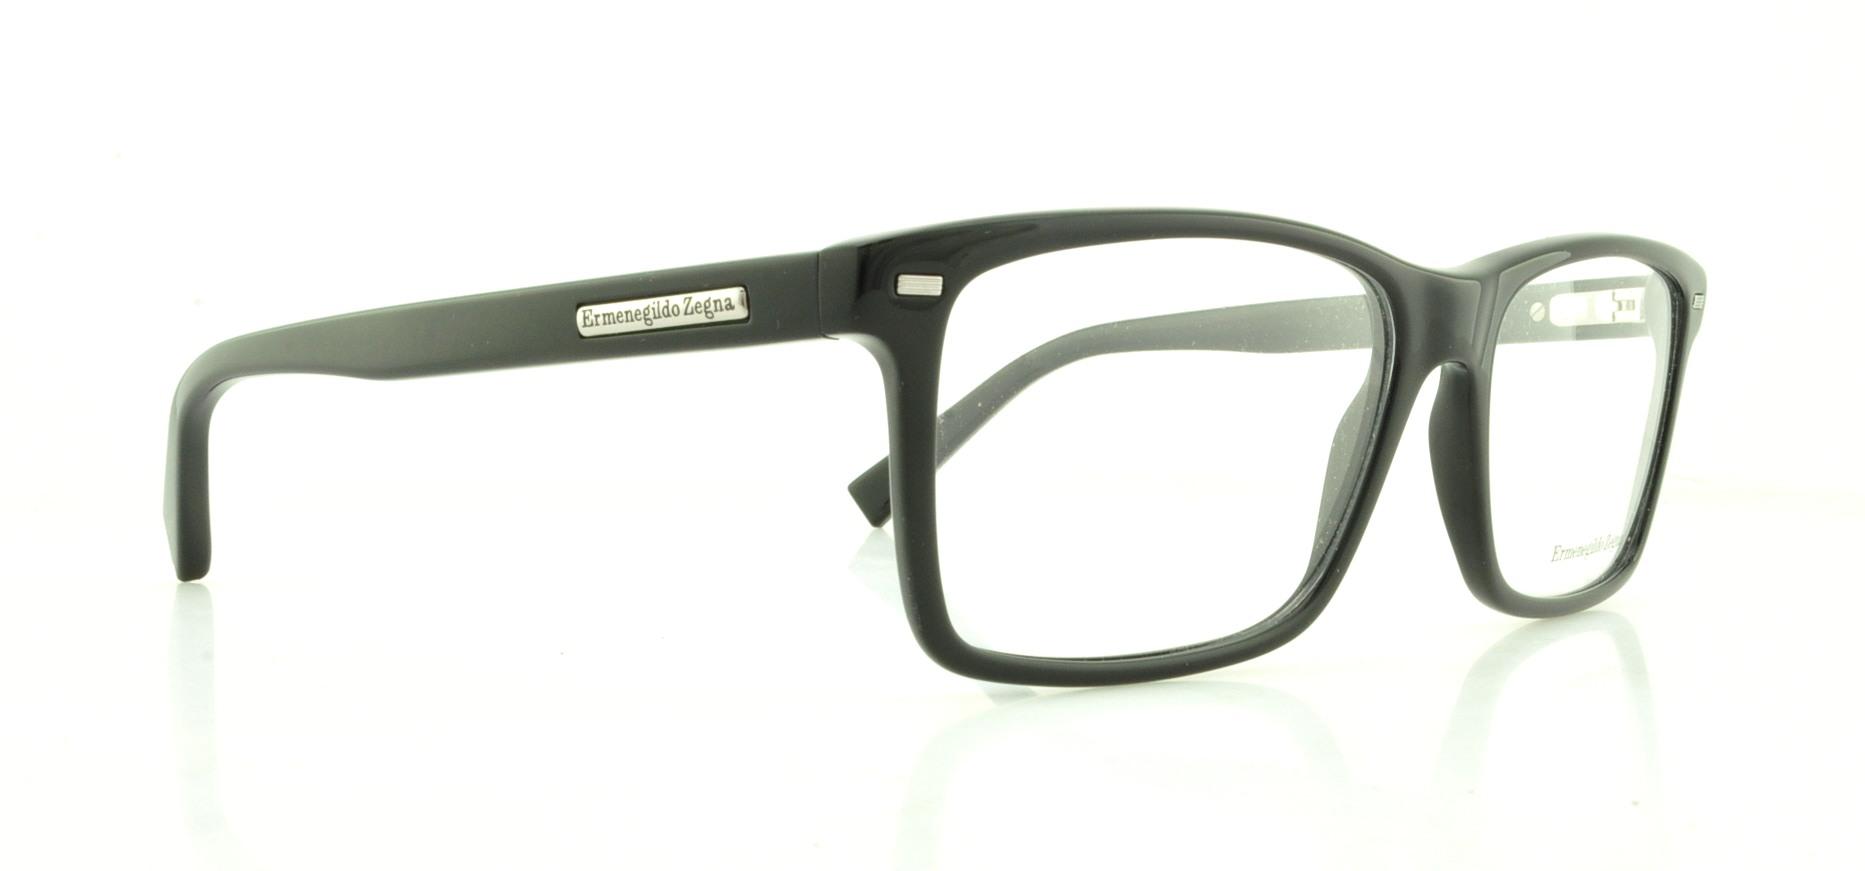 75e76db7940 Designer Frames Outlet. Ermenegildo Zegna EZ5002